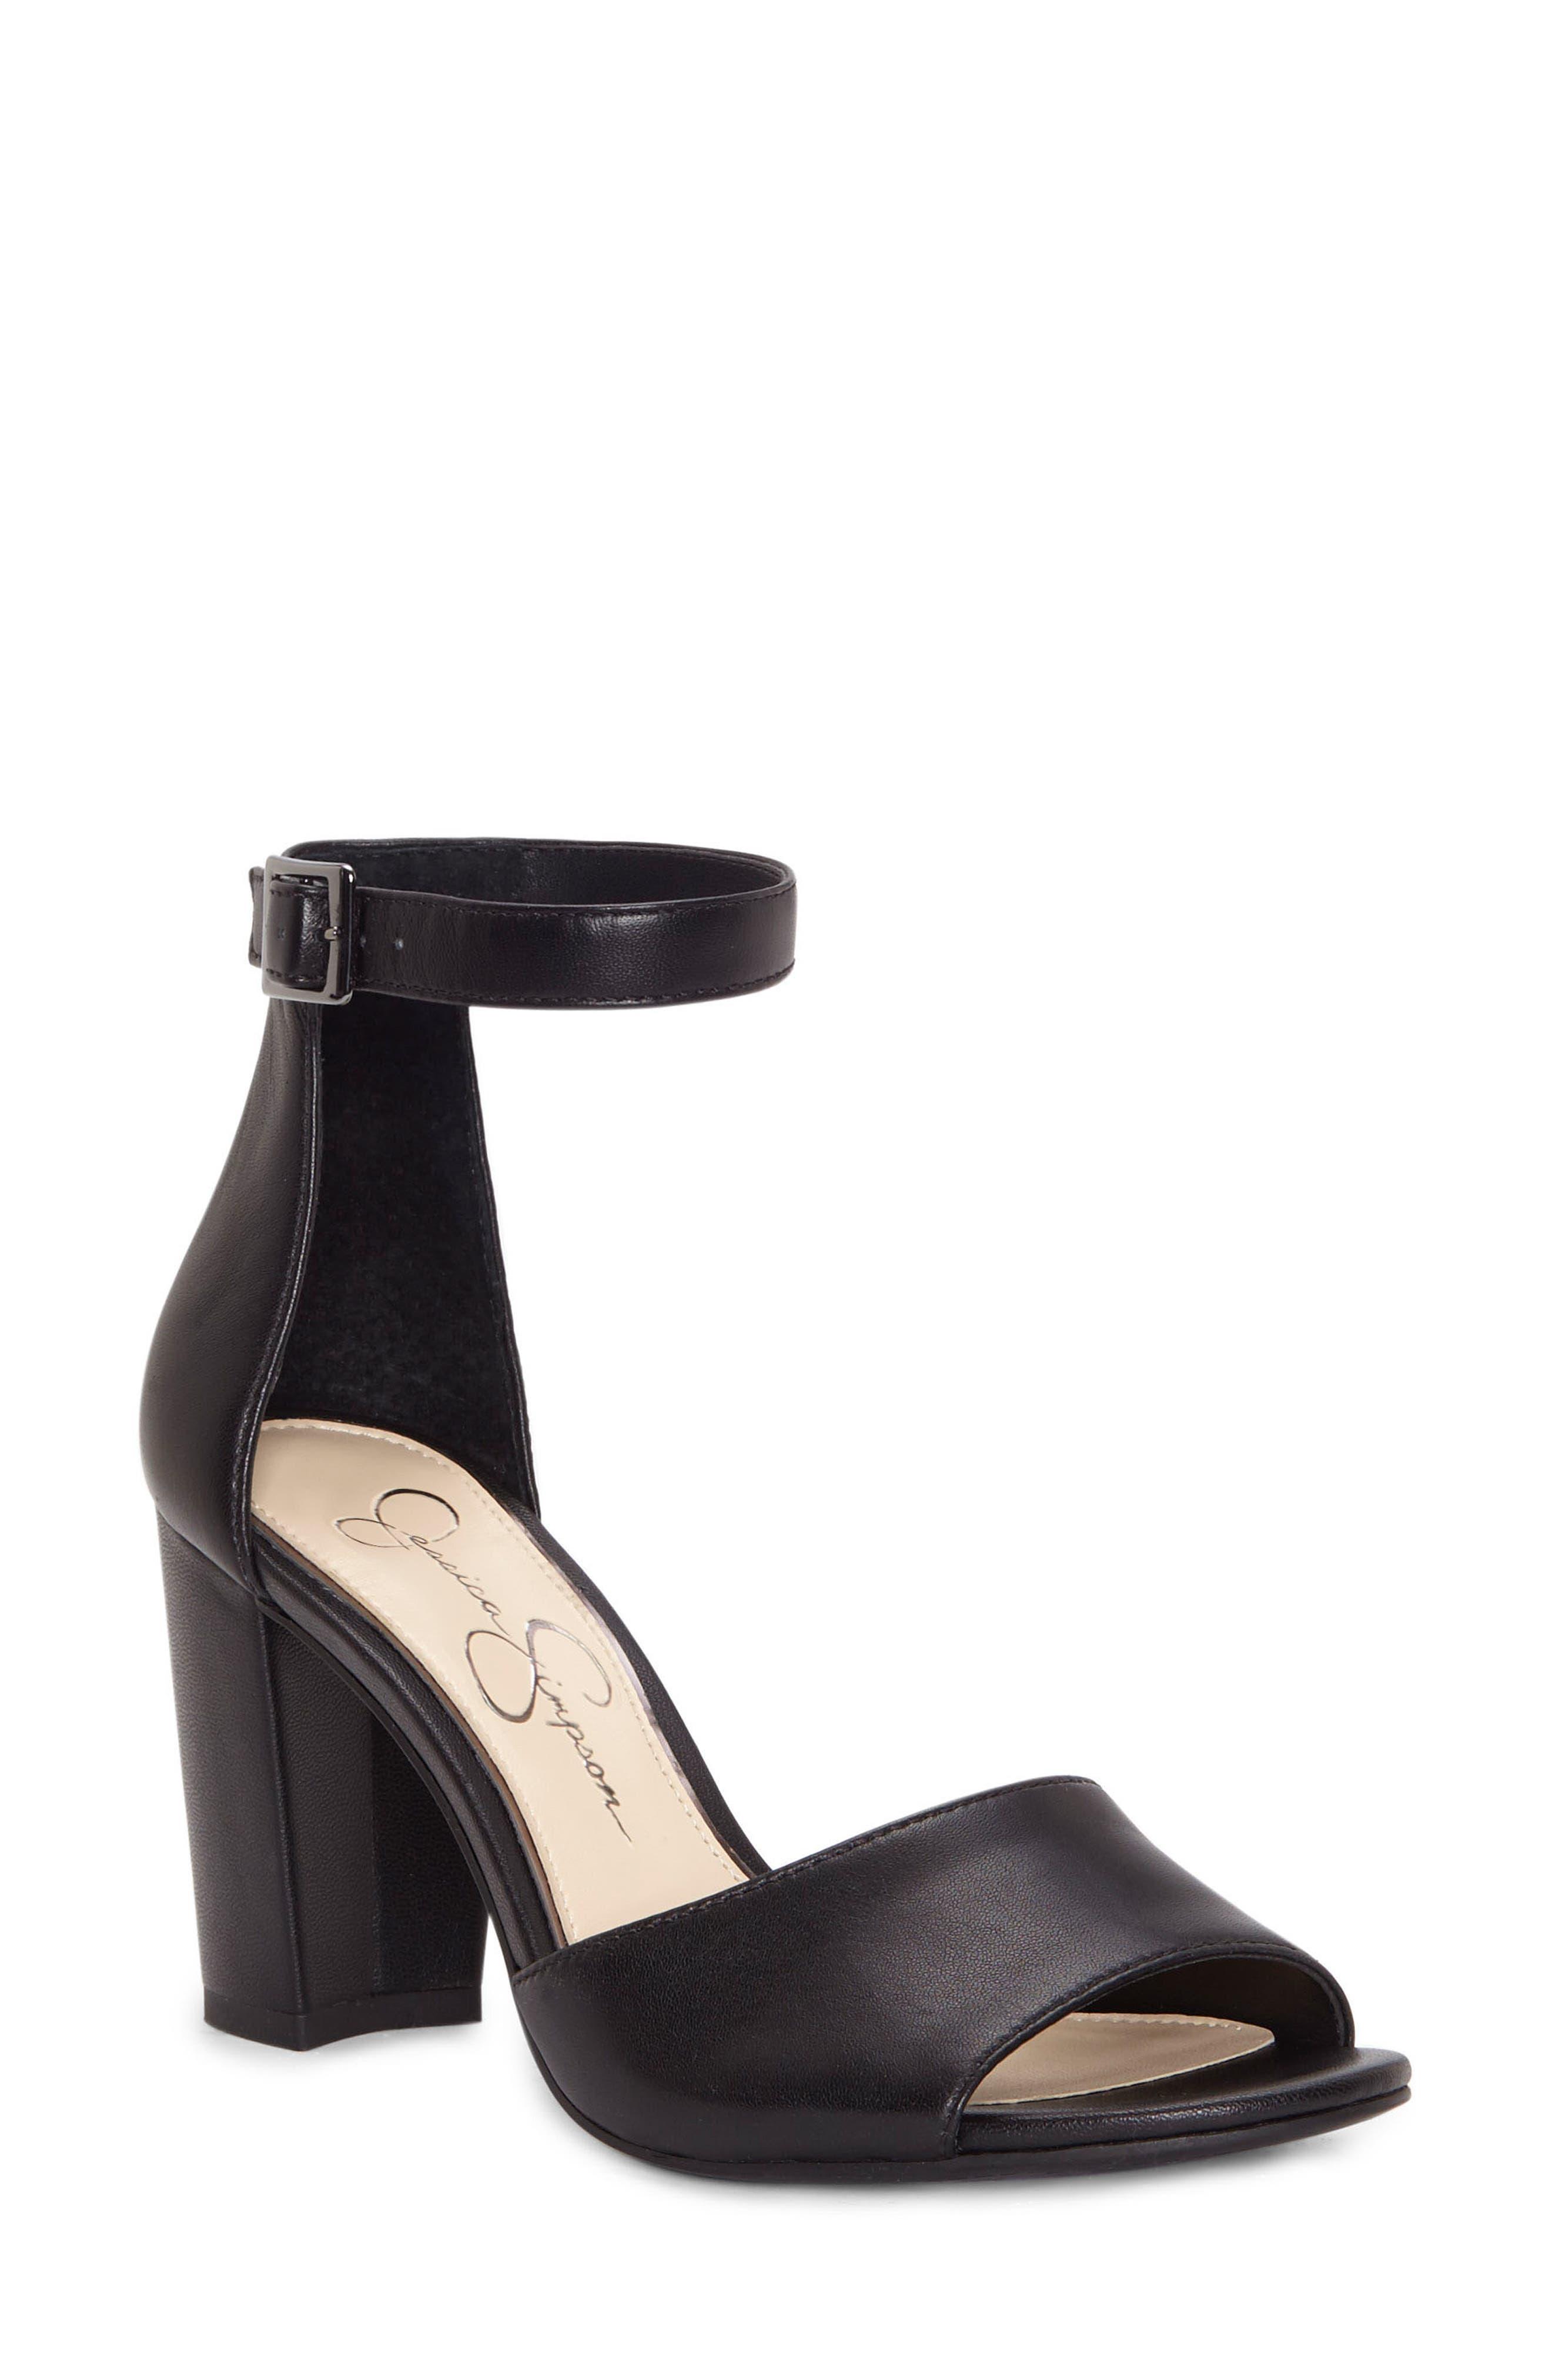 JESSICA SIMPSON Sherron Sandal, Main, color, BLACK SOFT SILK